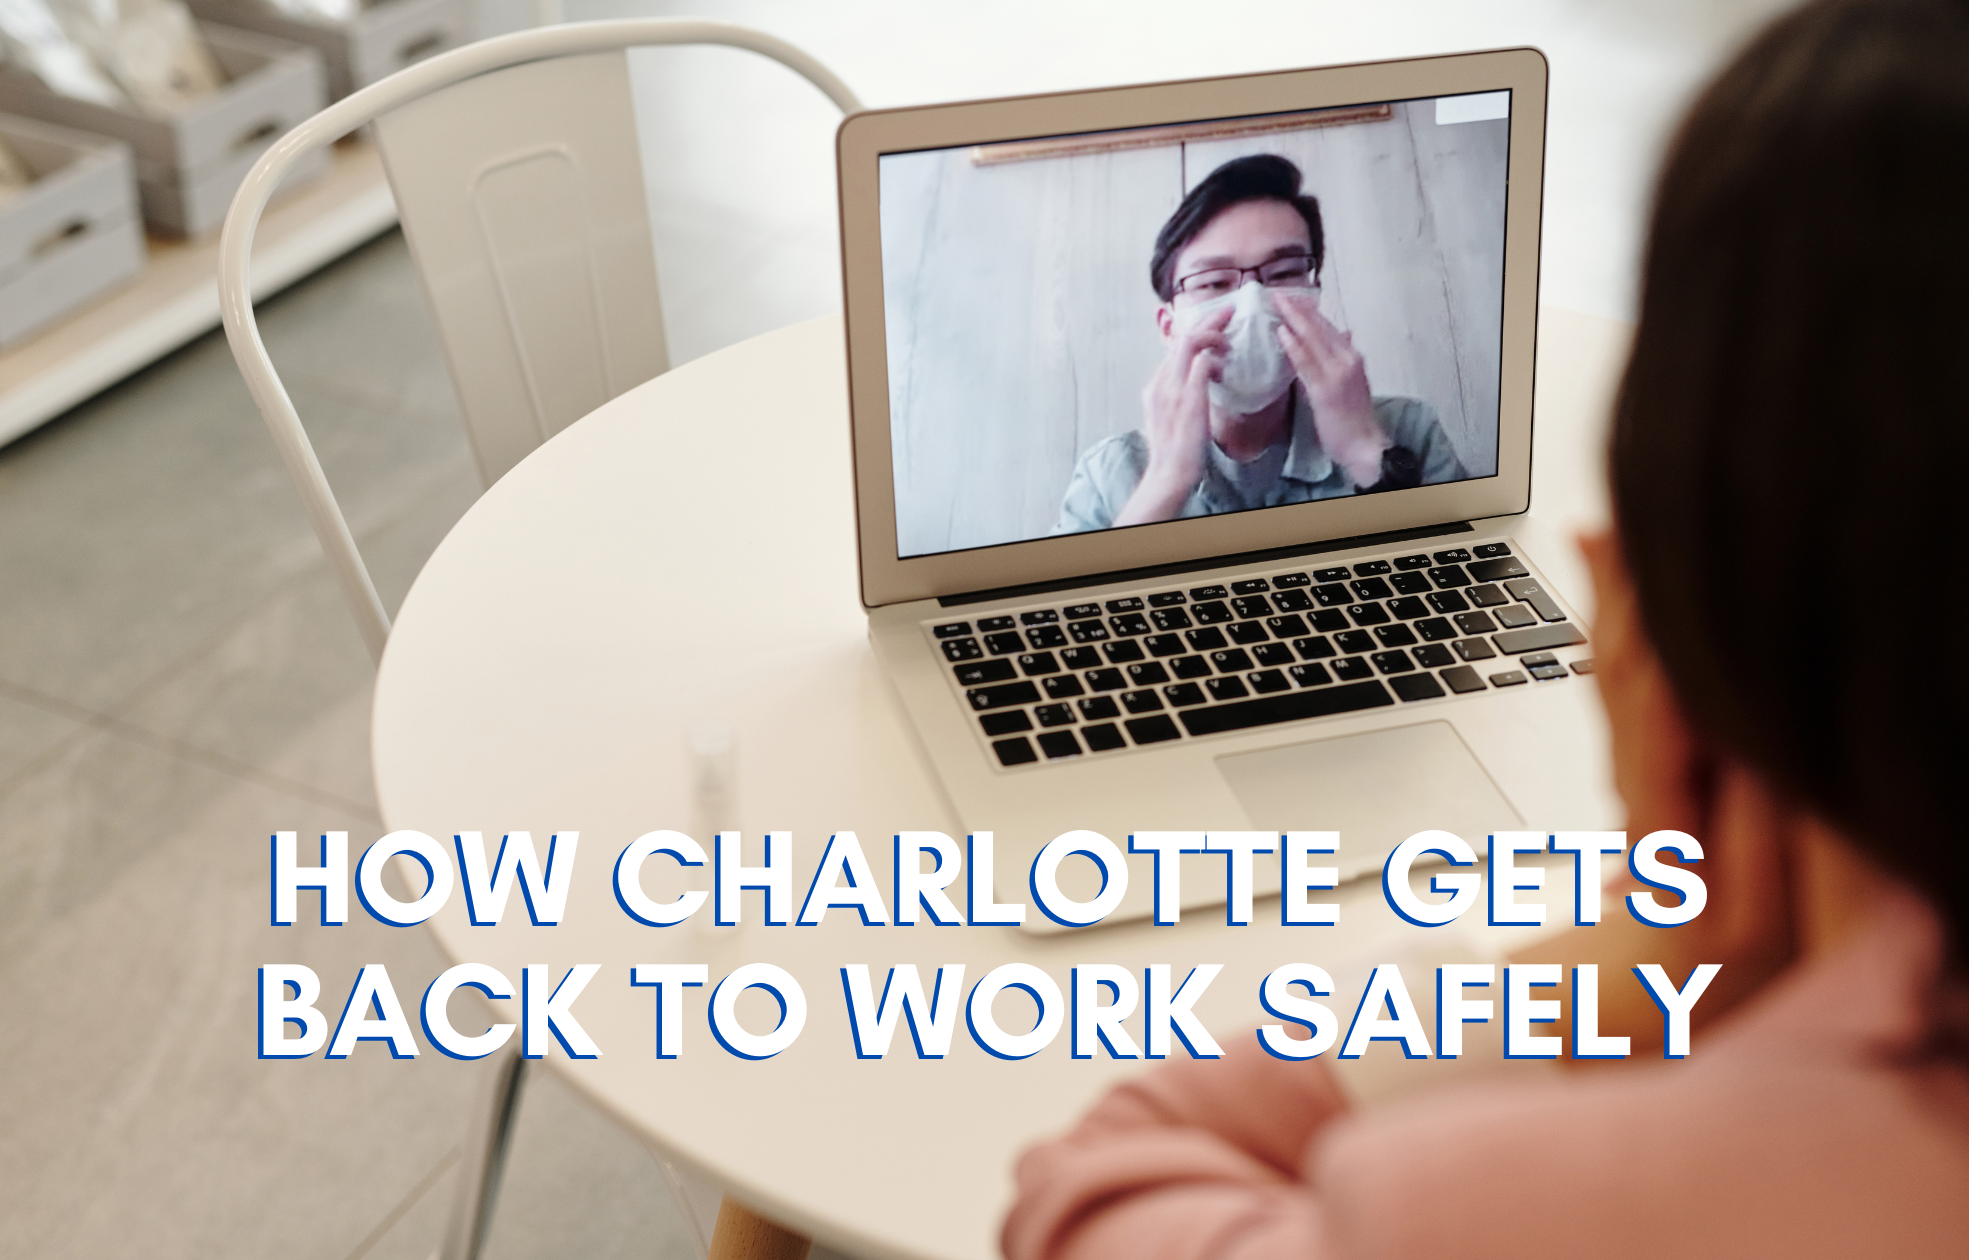 Charlotte Back to Work Safely - LBU LPs